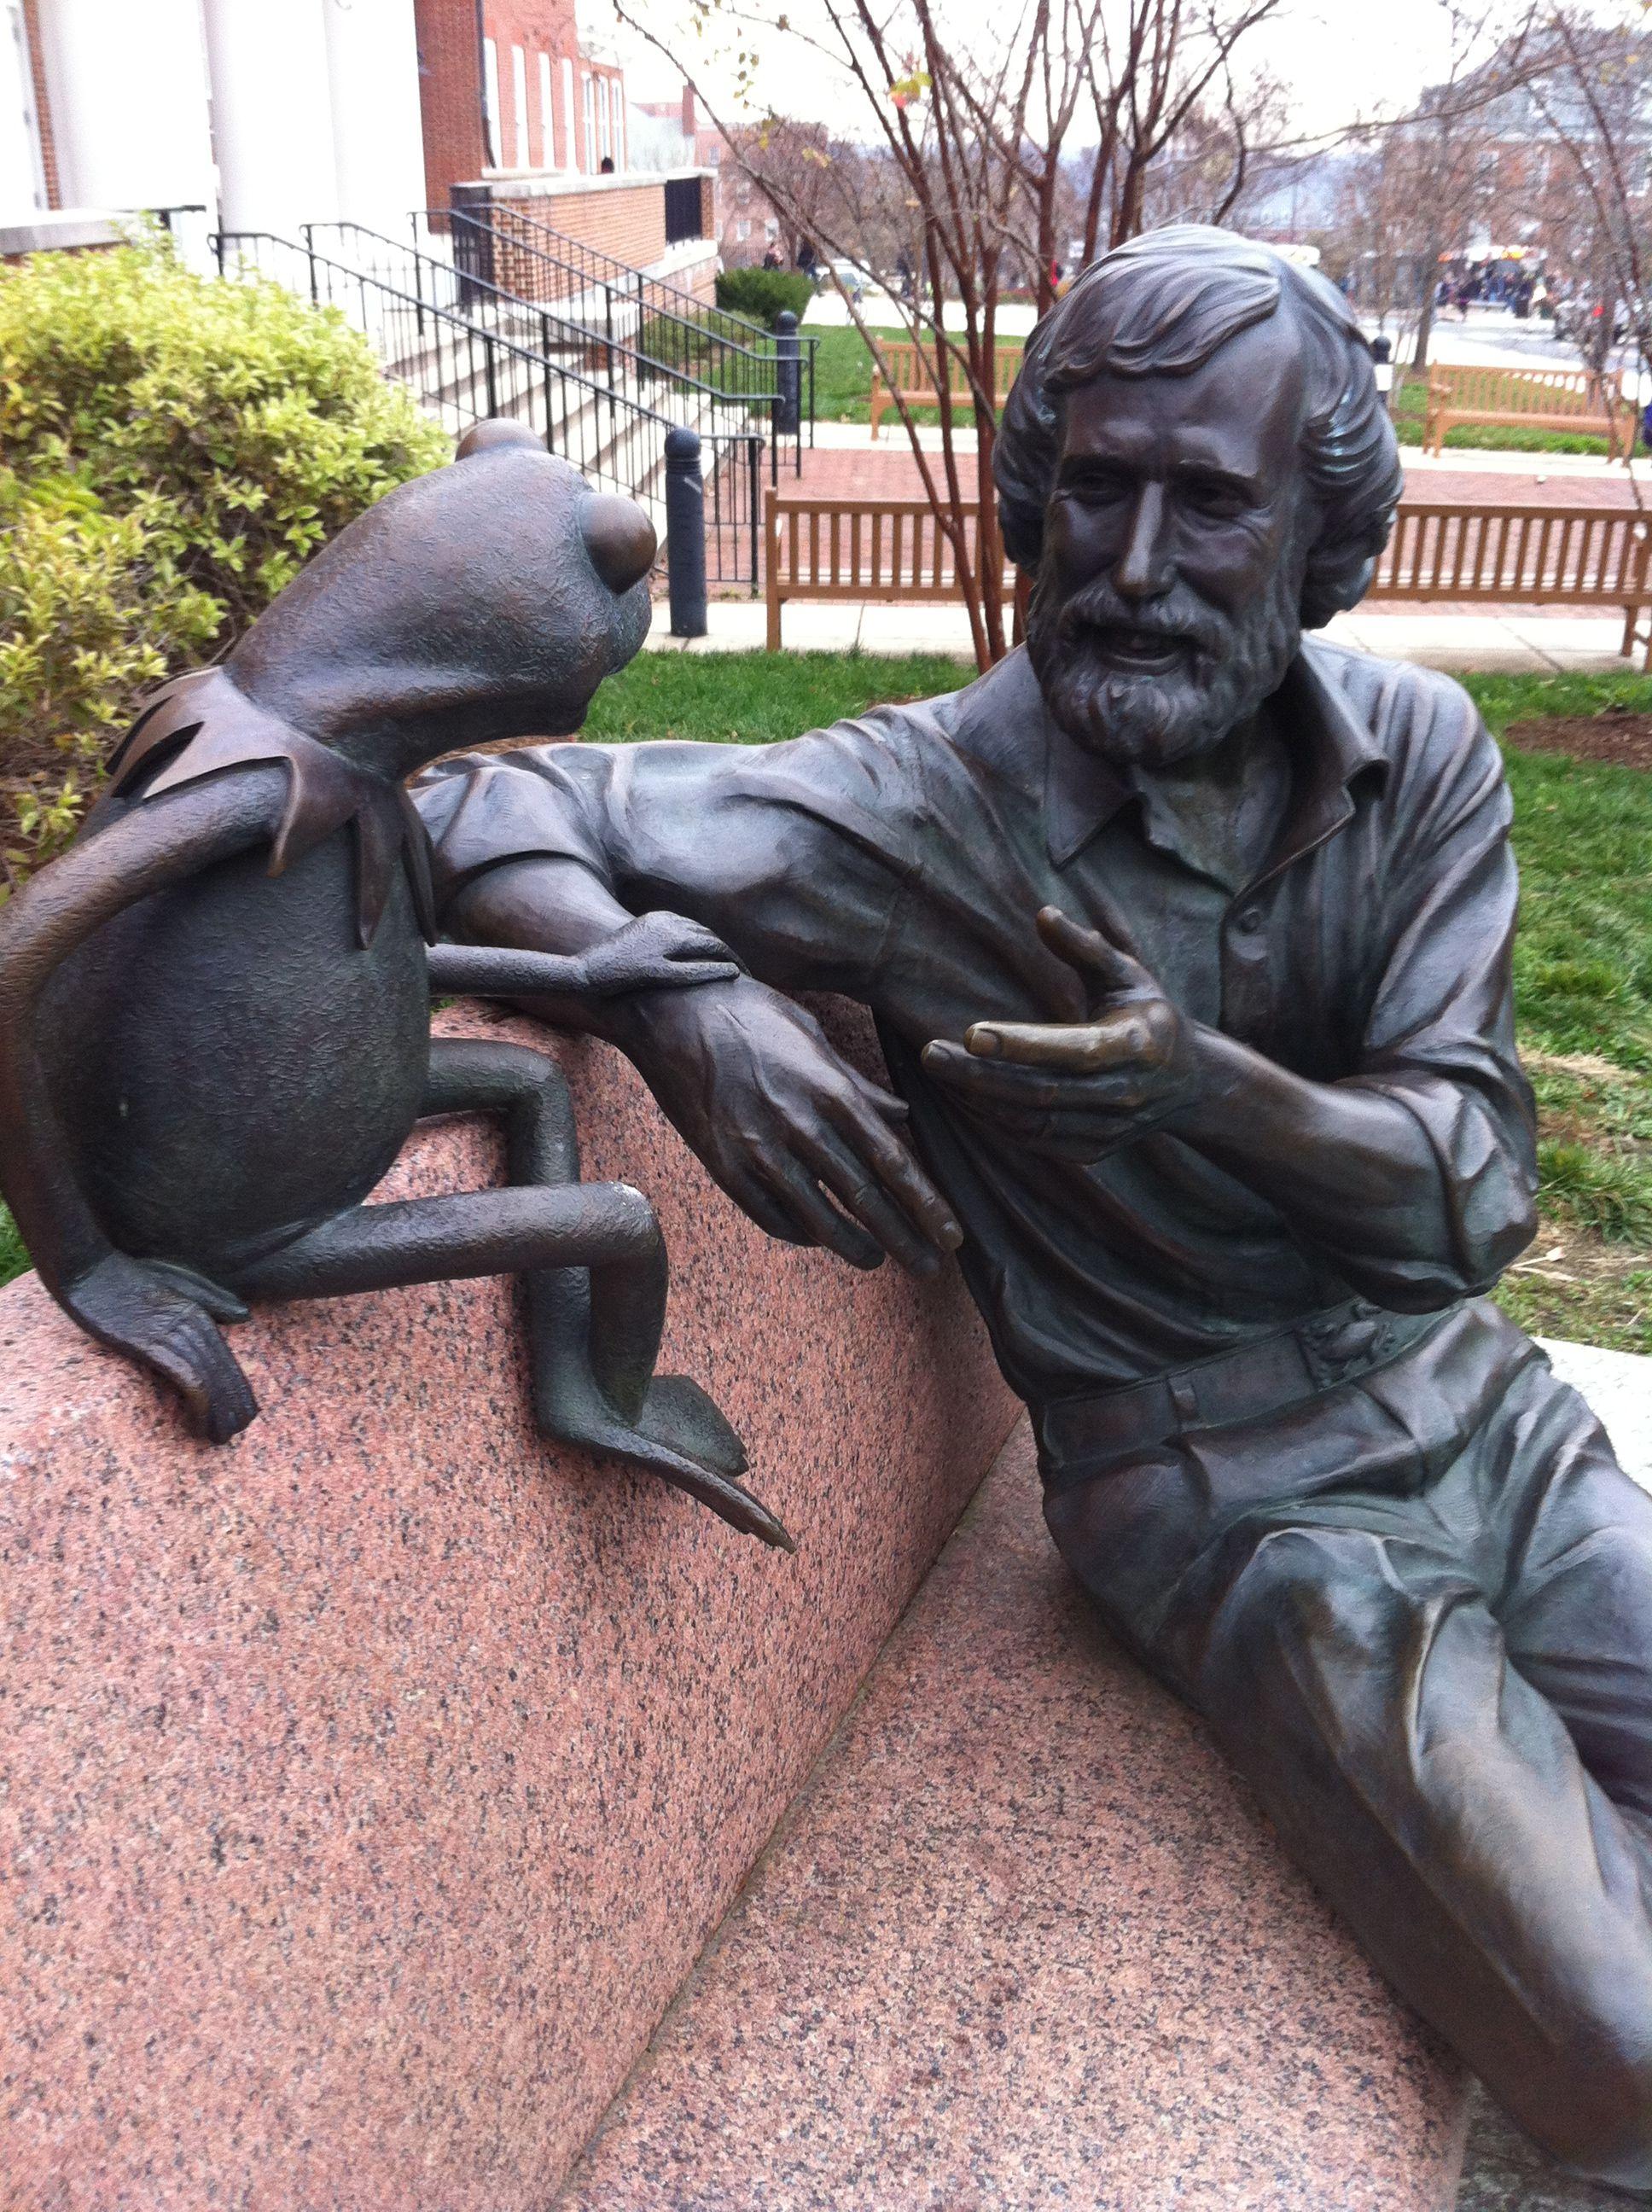 Jim Henson Statue | Cemetery Sculpture and Art | Jim henson